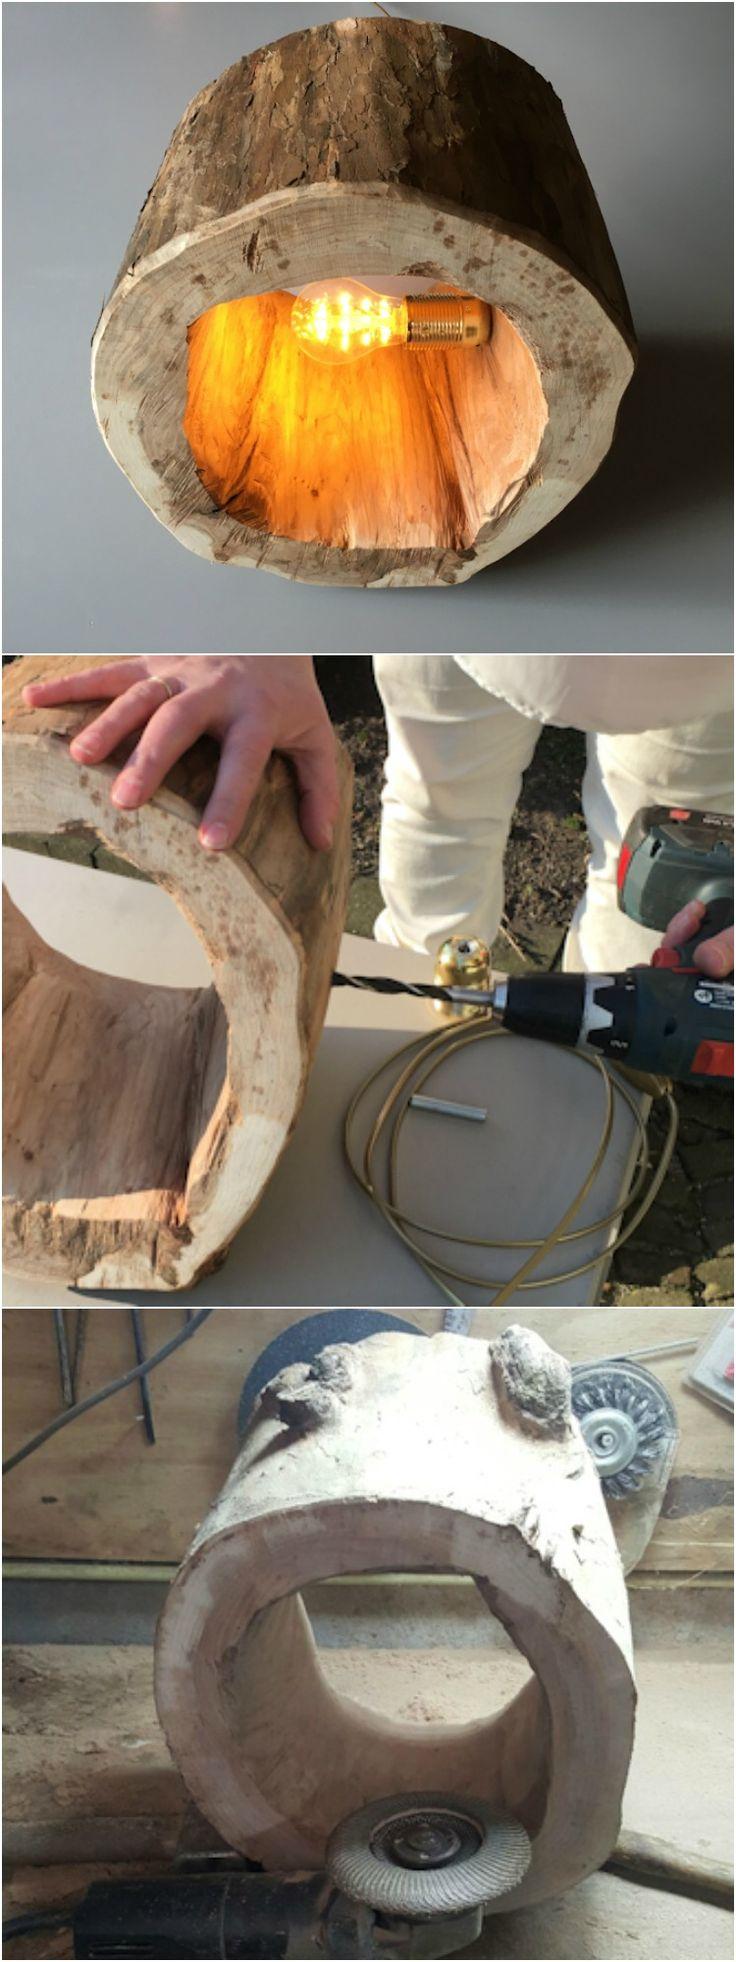 Interessante Lampenidee. Sehr rustikal. Awesome How to Make a Spectacular Stump Floor Lamp #DIY #Handmade #LightBulb…